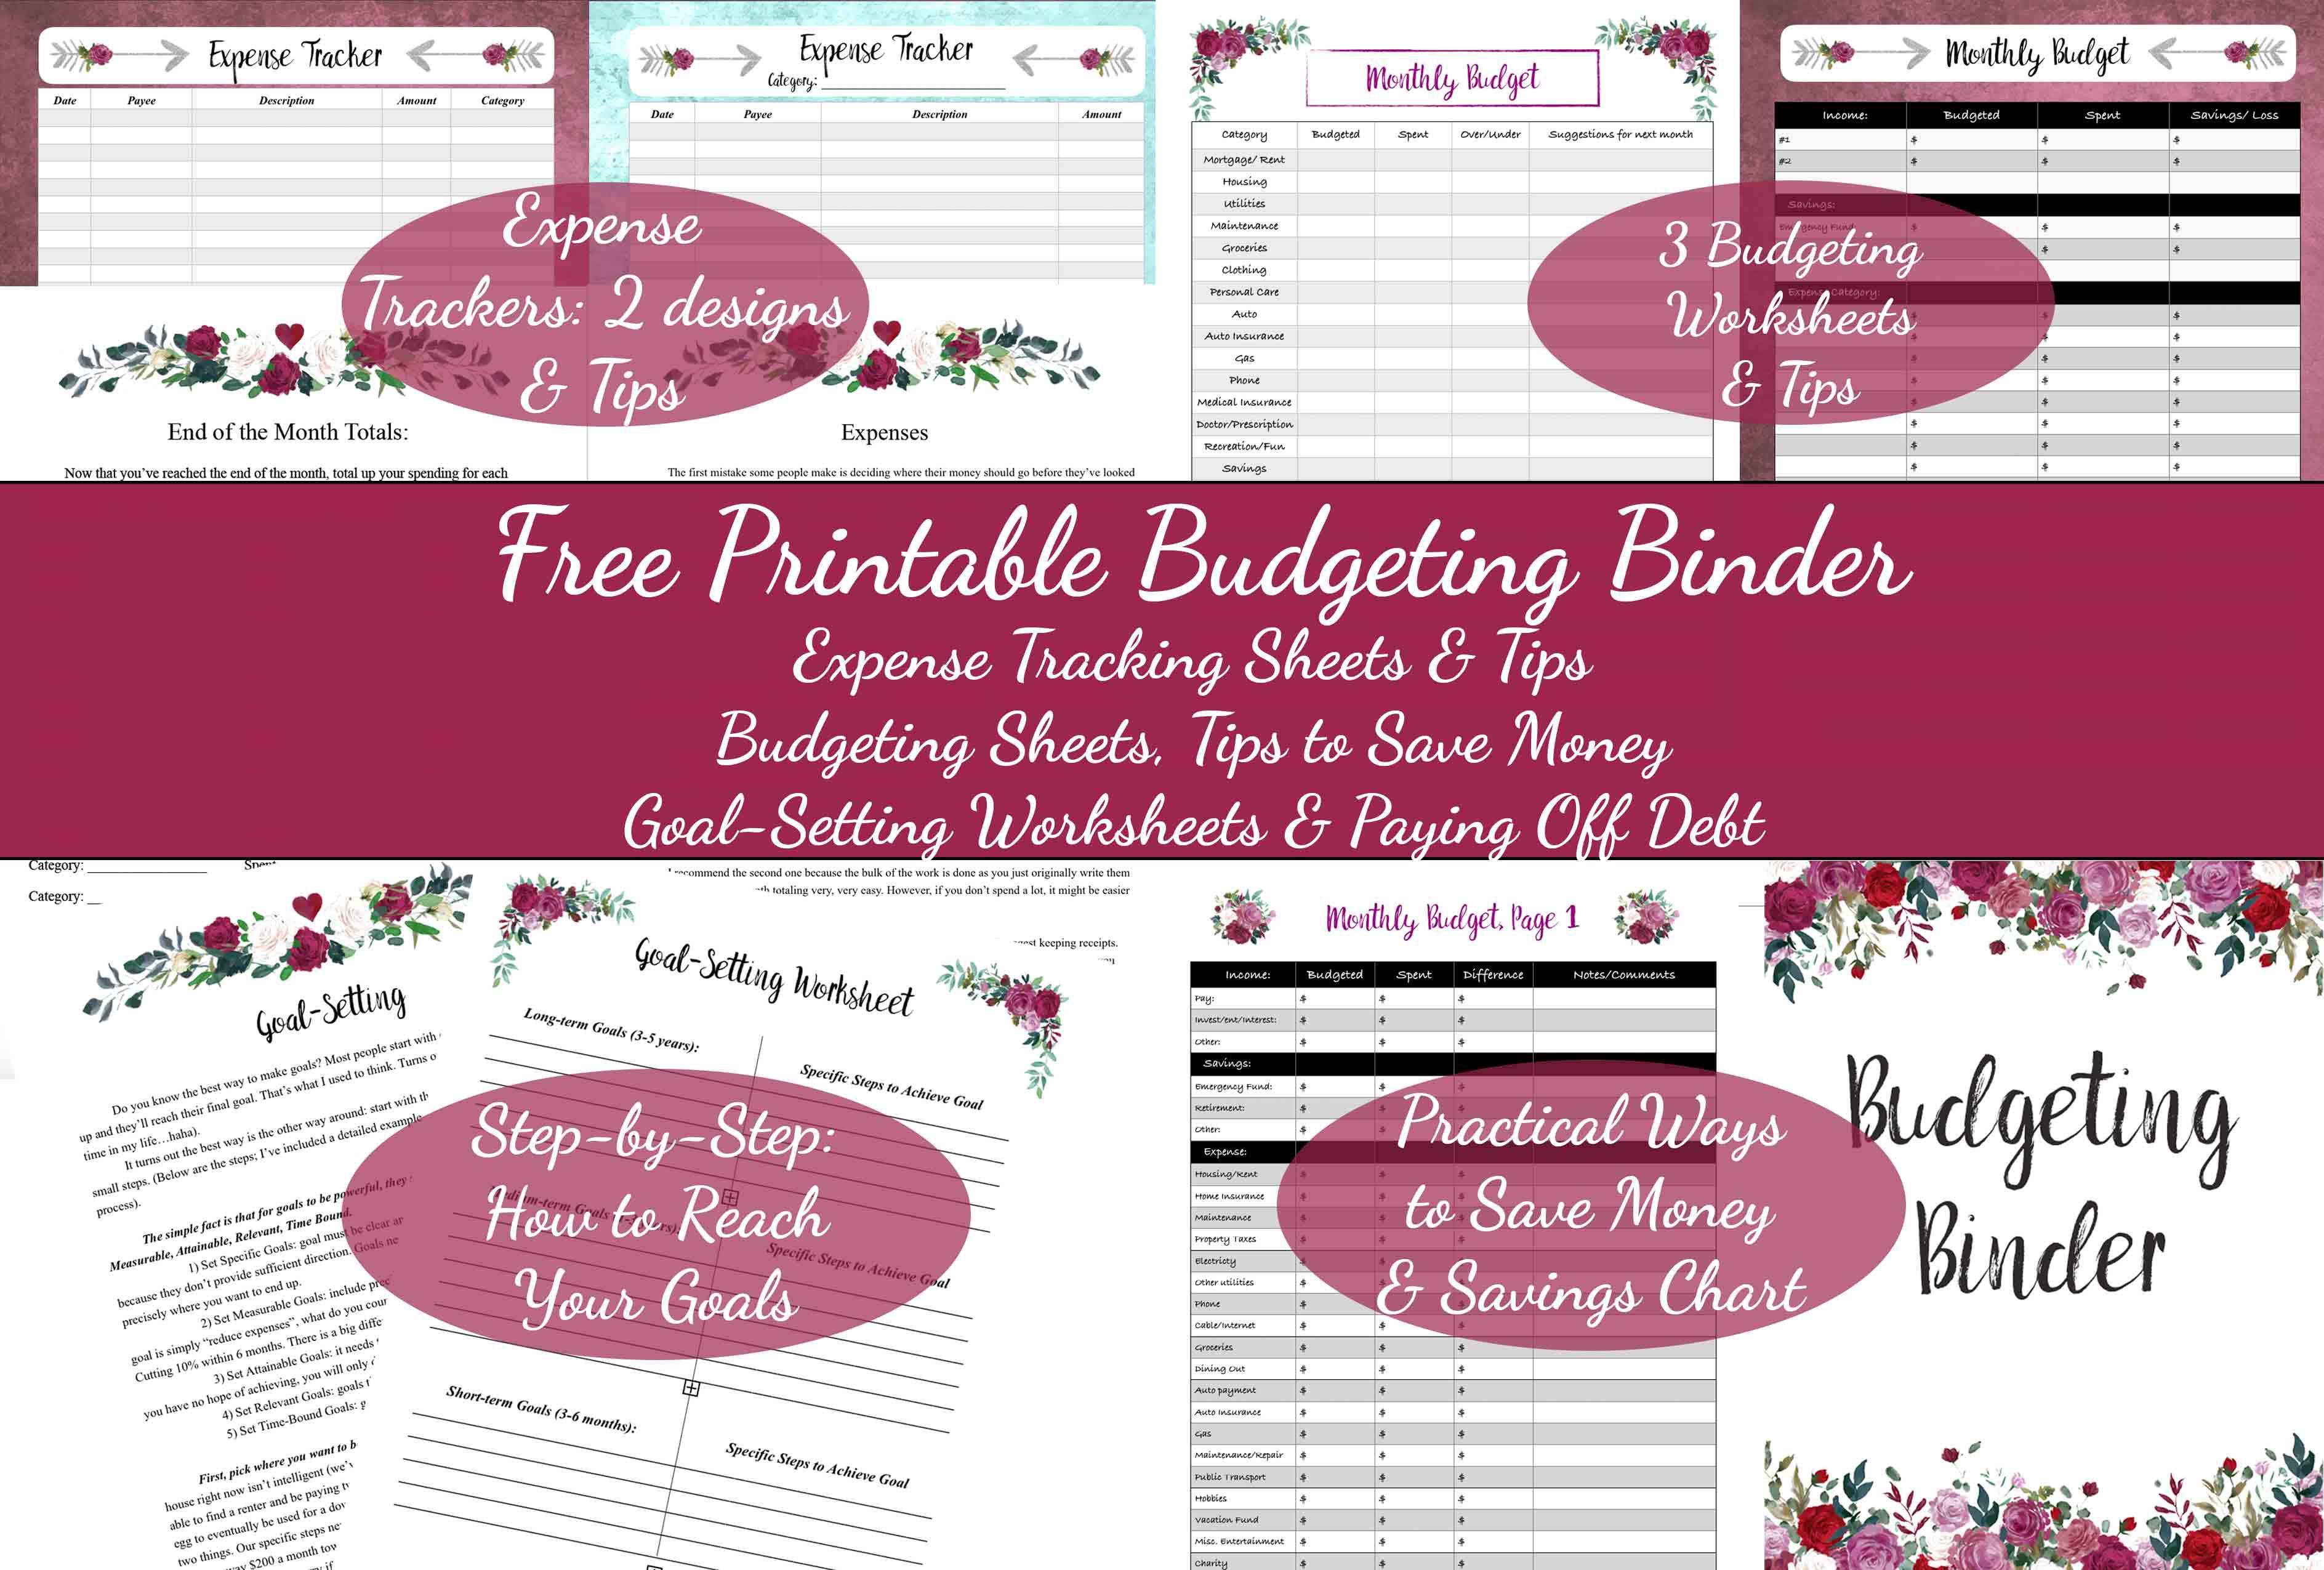 Free Printable Budgeting Binder 15 Pages